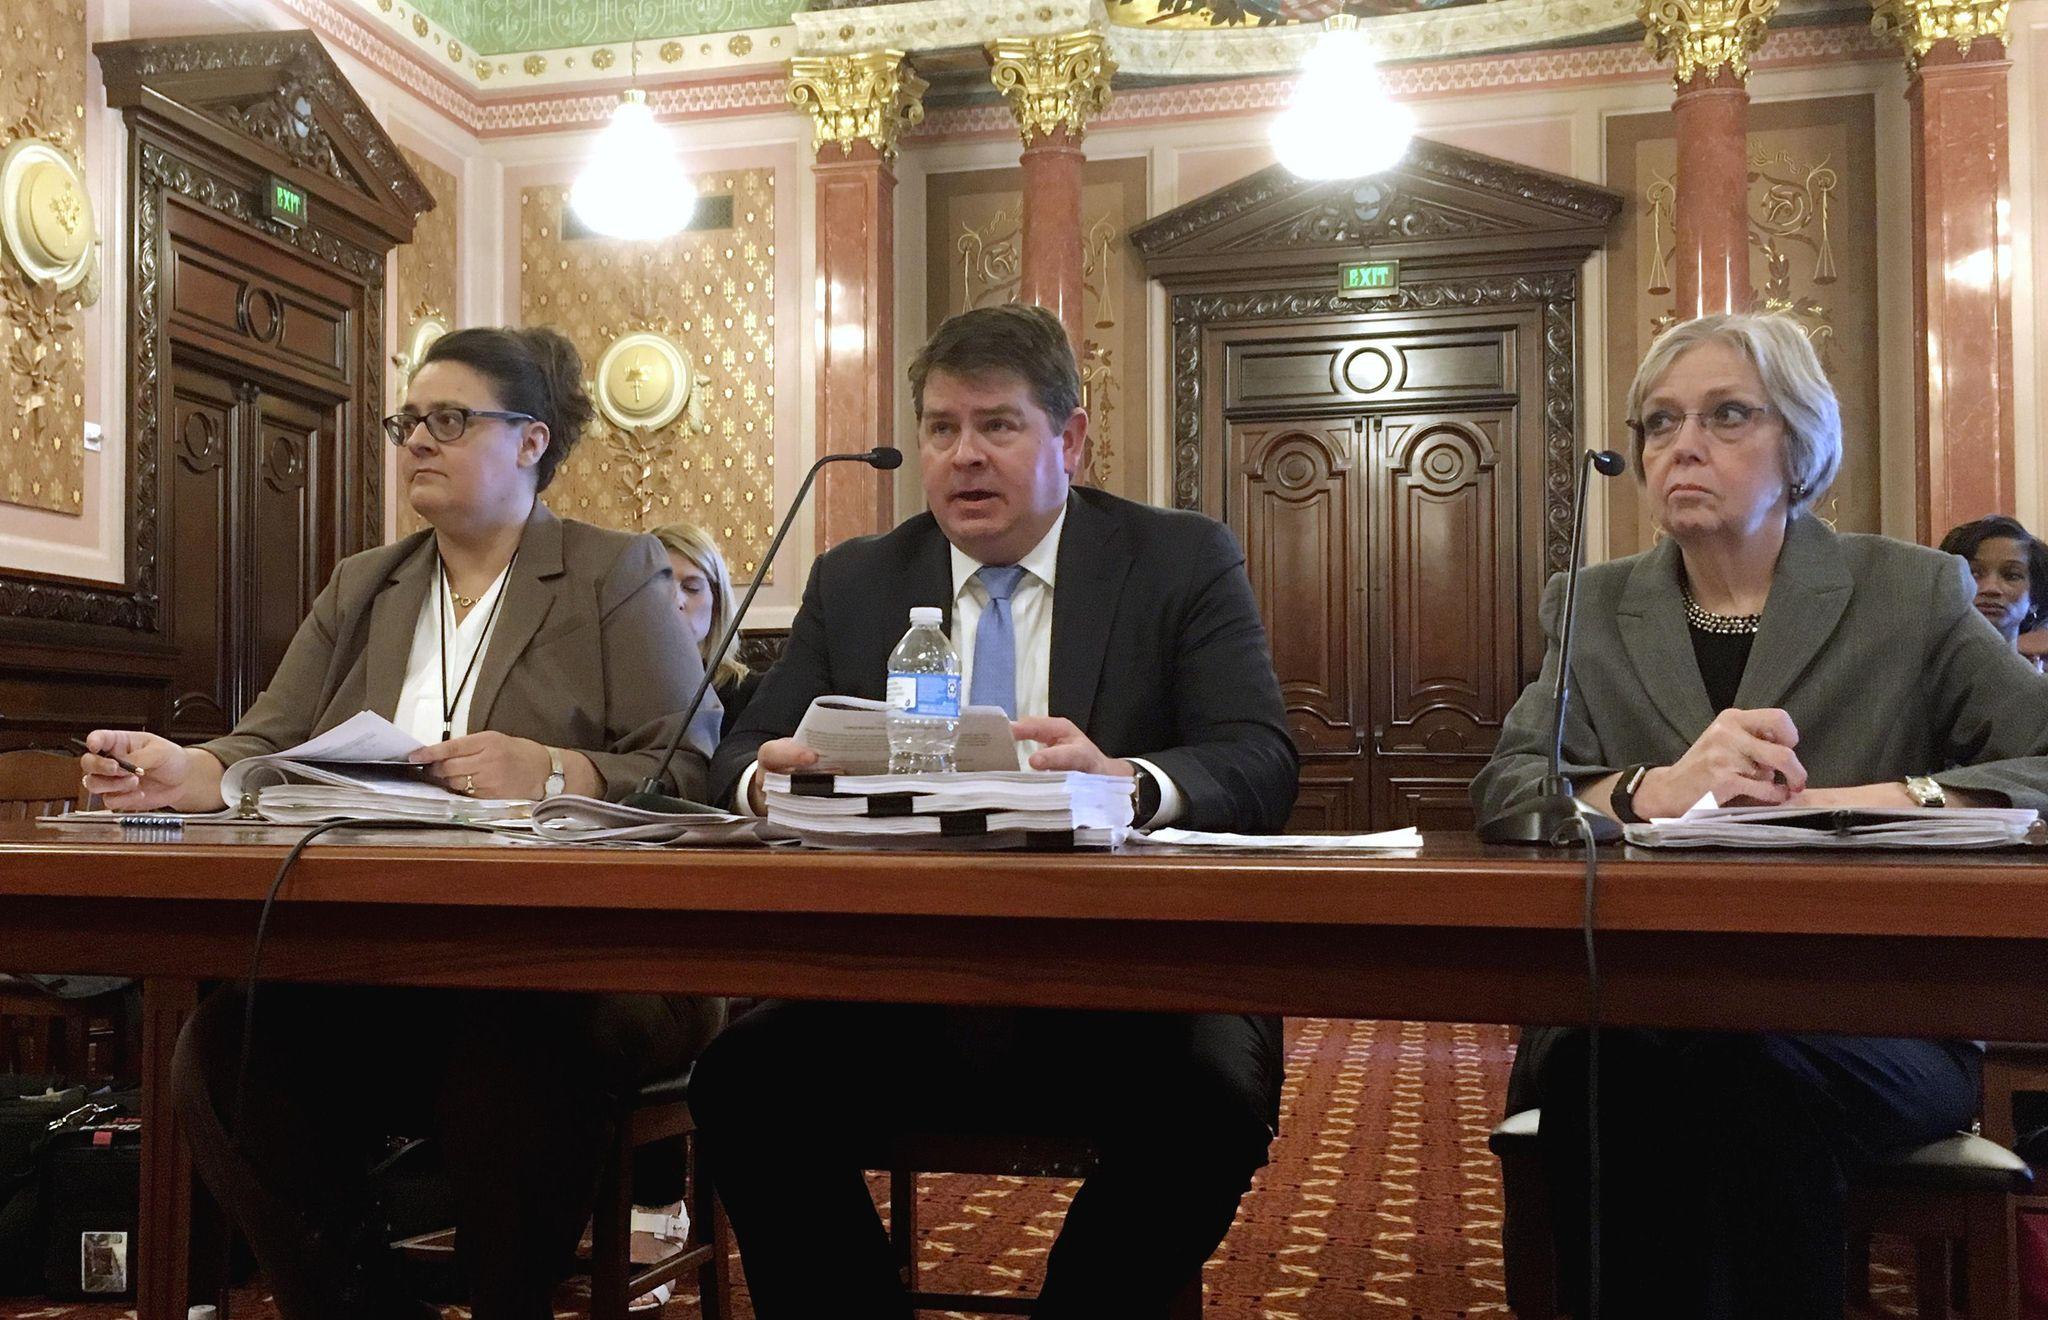 For Illinois $245M Legionnaires' fix, rhetoric meets reality - Washington Times